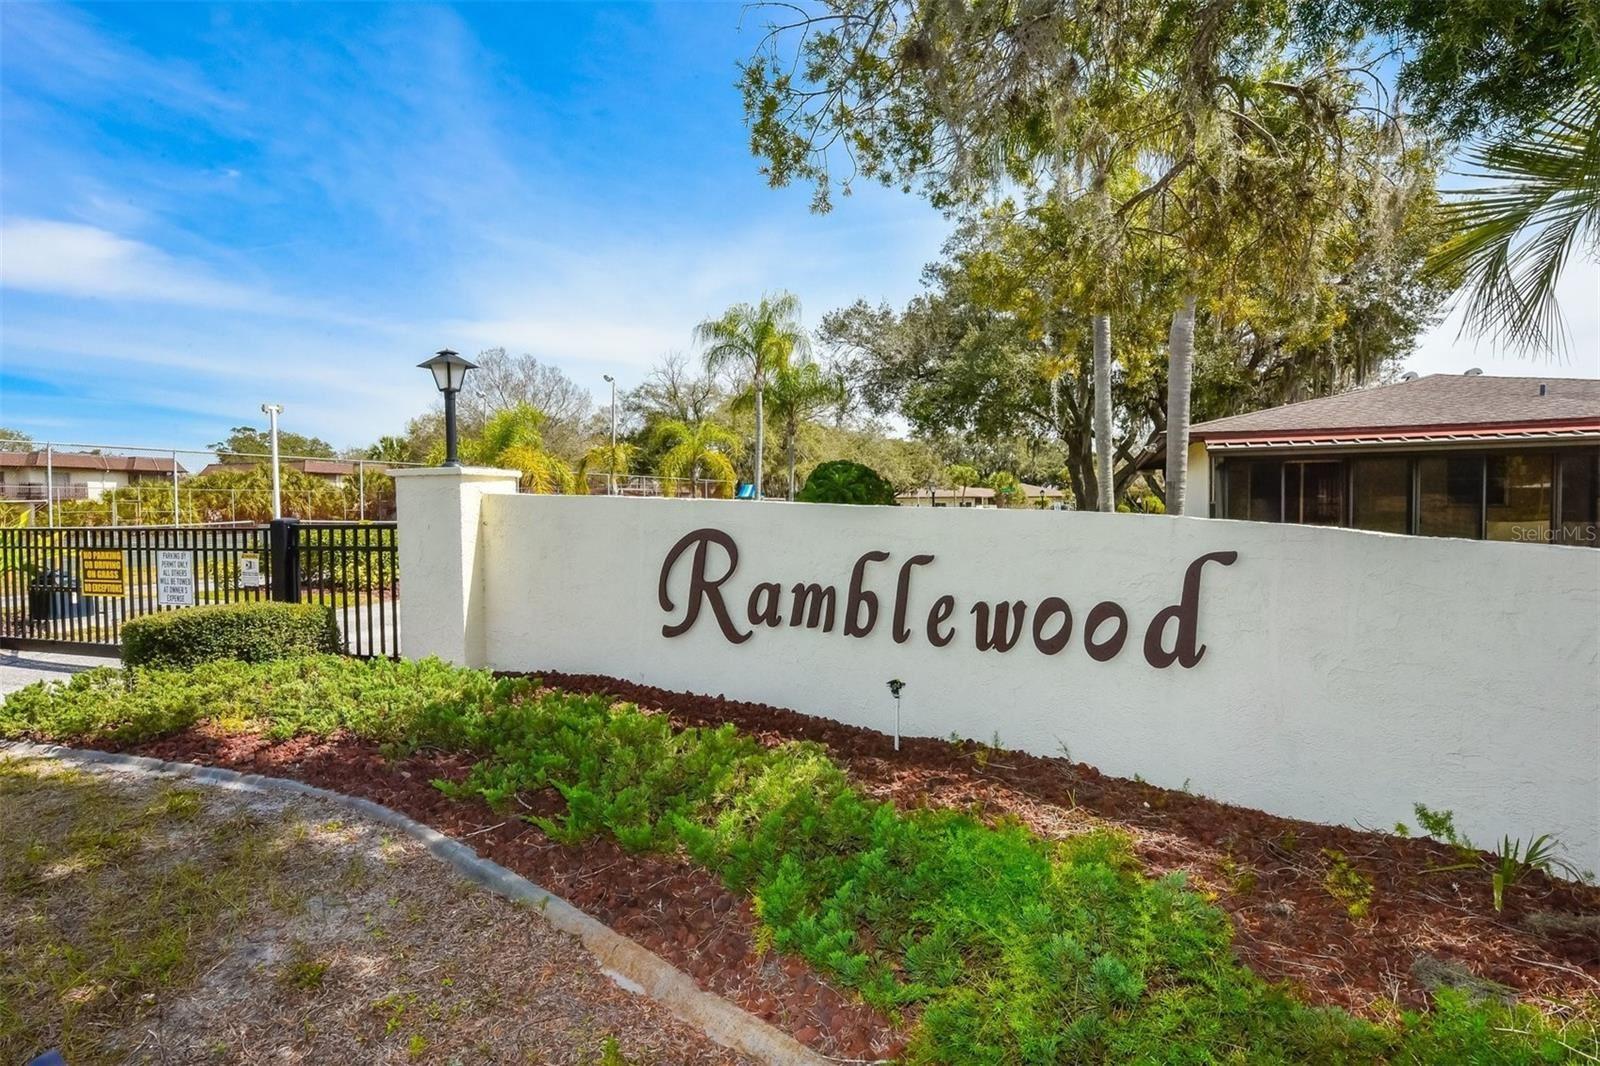 Photo of 3208 RAMBLEWOOD DRIVE N, SARASOTA, FL 34237 (MLS # U8138584)